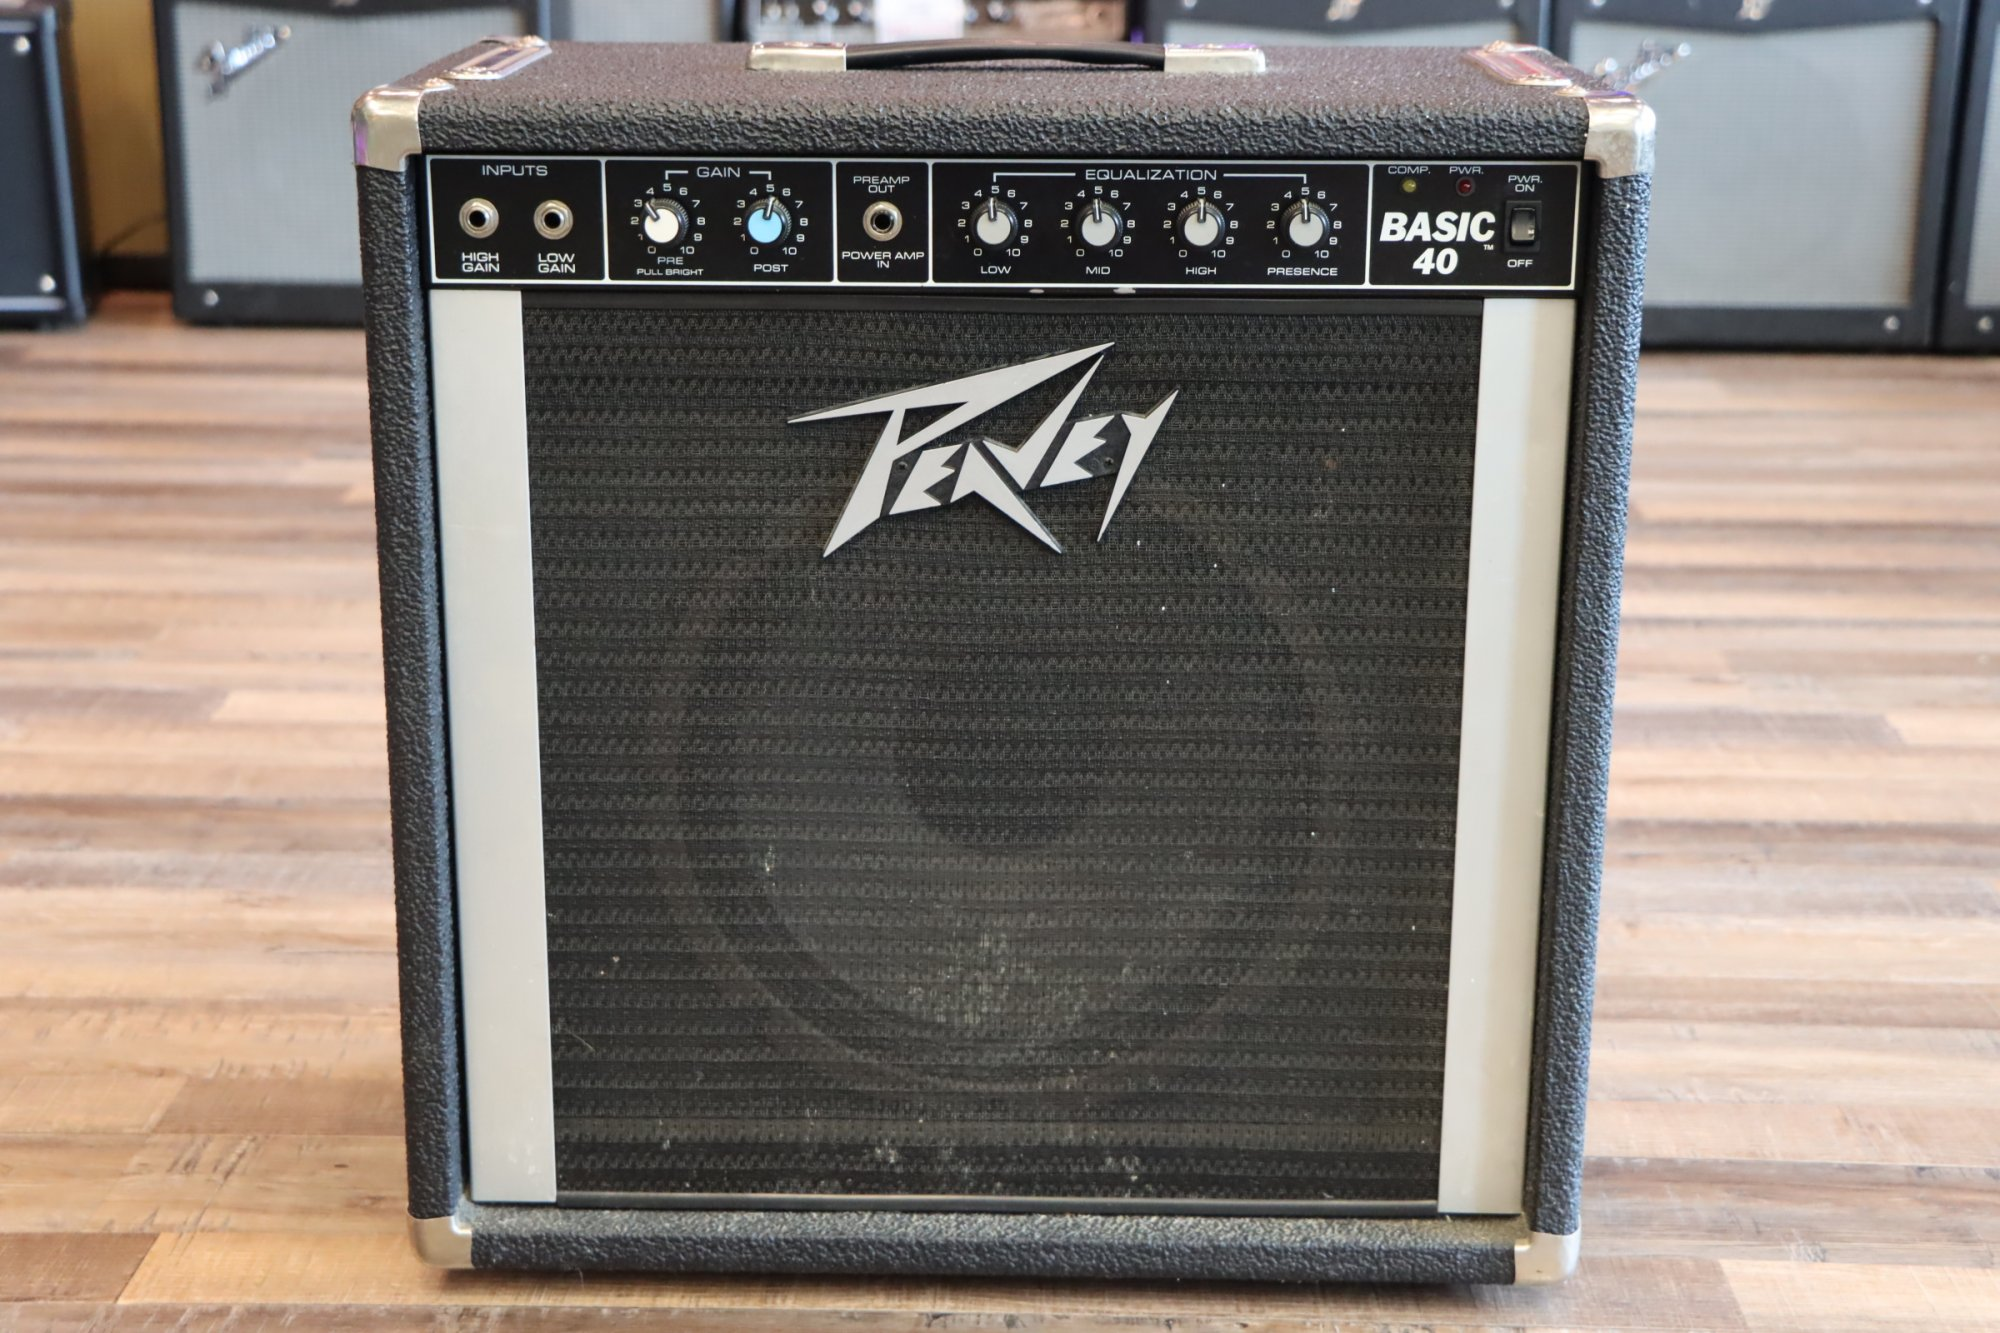 USED Vintage Peavey Basic 40 Bass/Keyboard Combo Amplifier